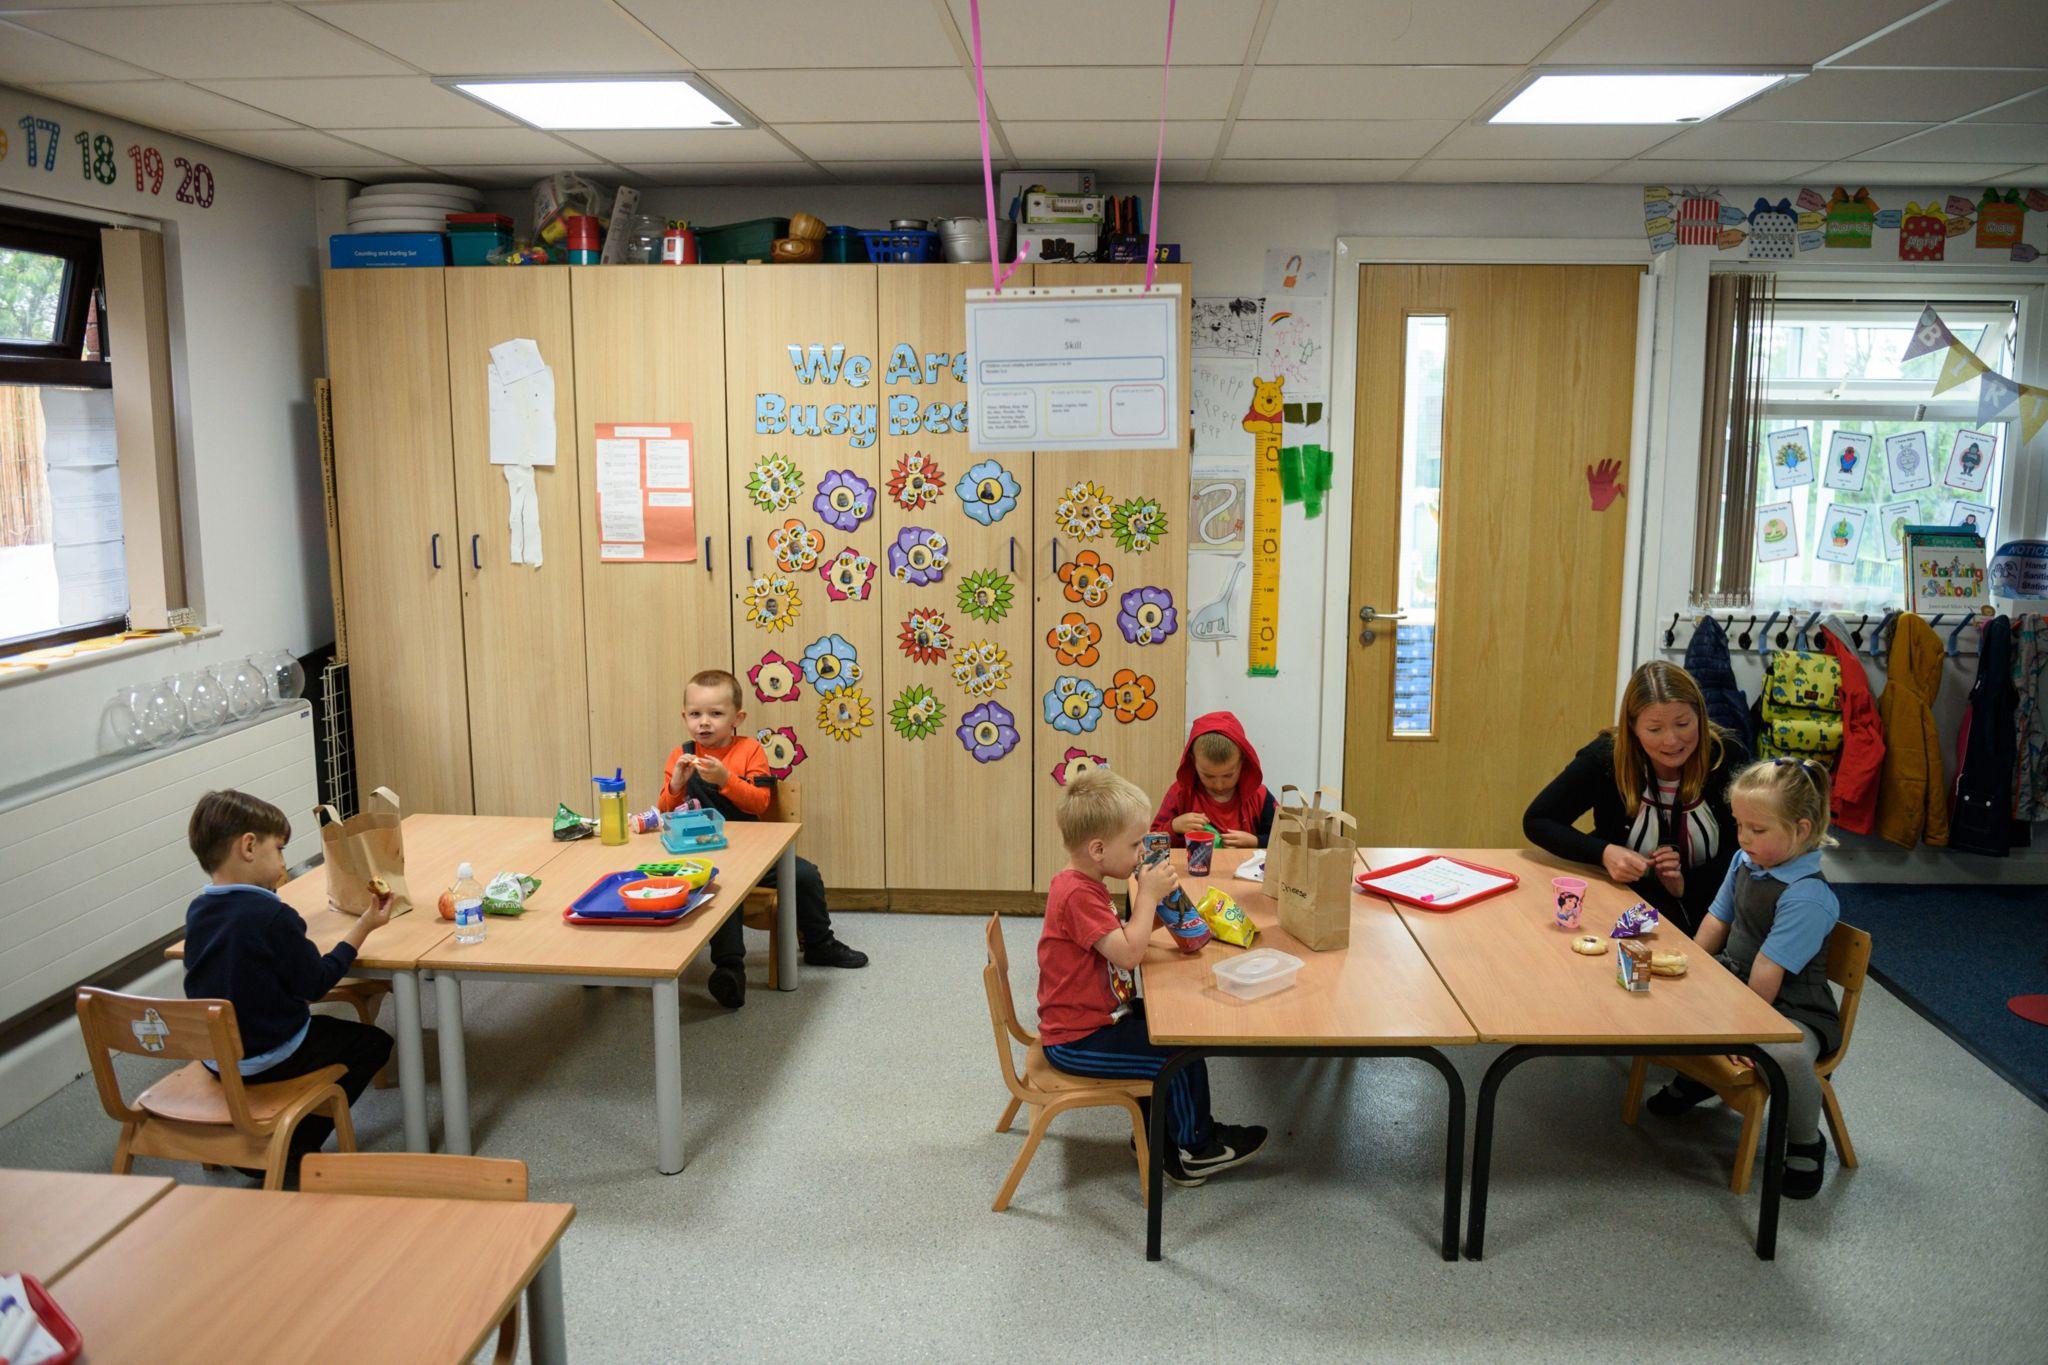 Pre-school teacher supervises a group of young children